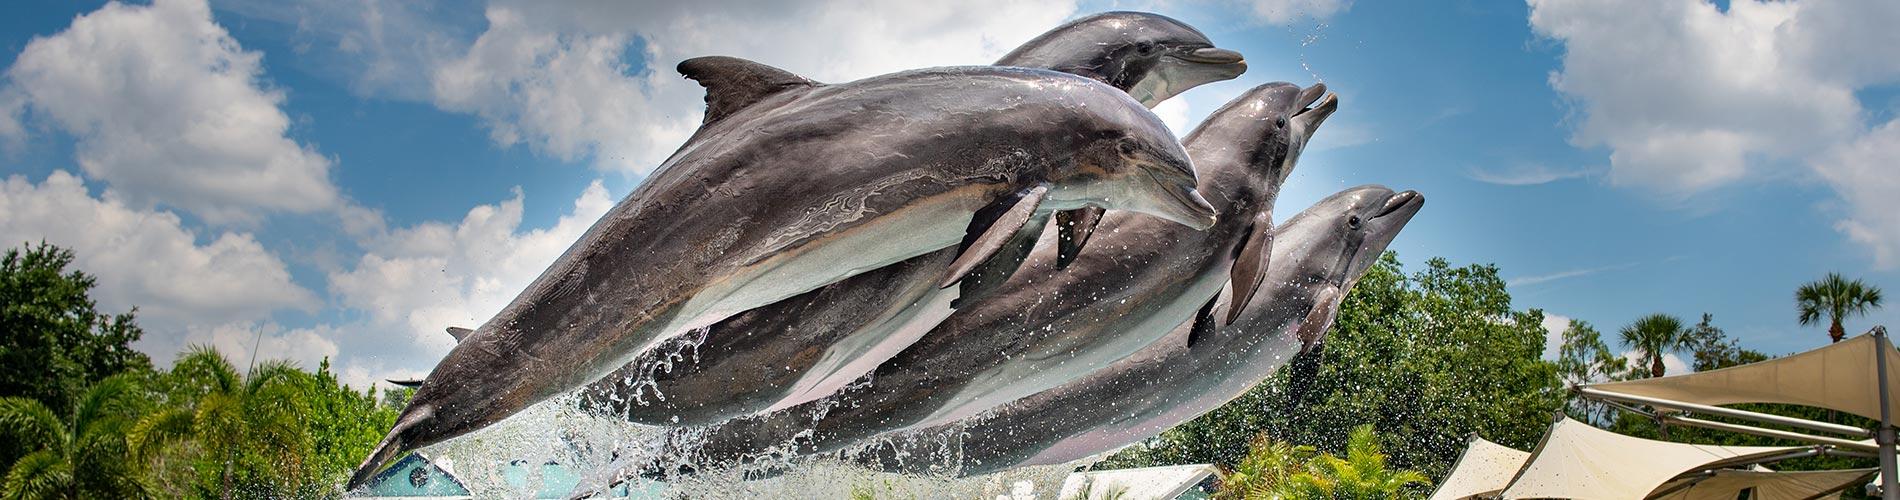 Dolphin Adventures at SeaWorld Orlando